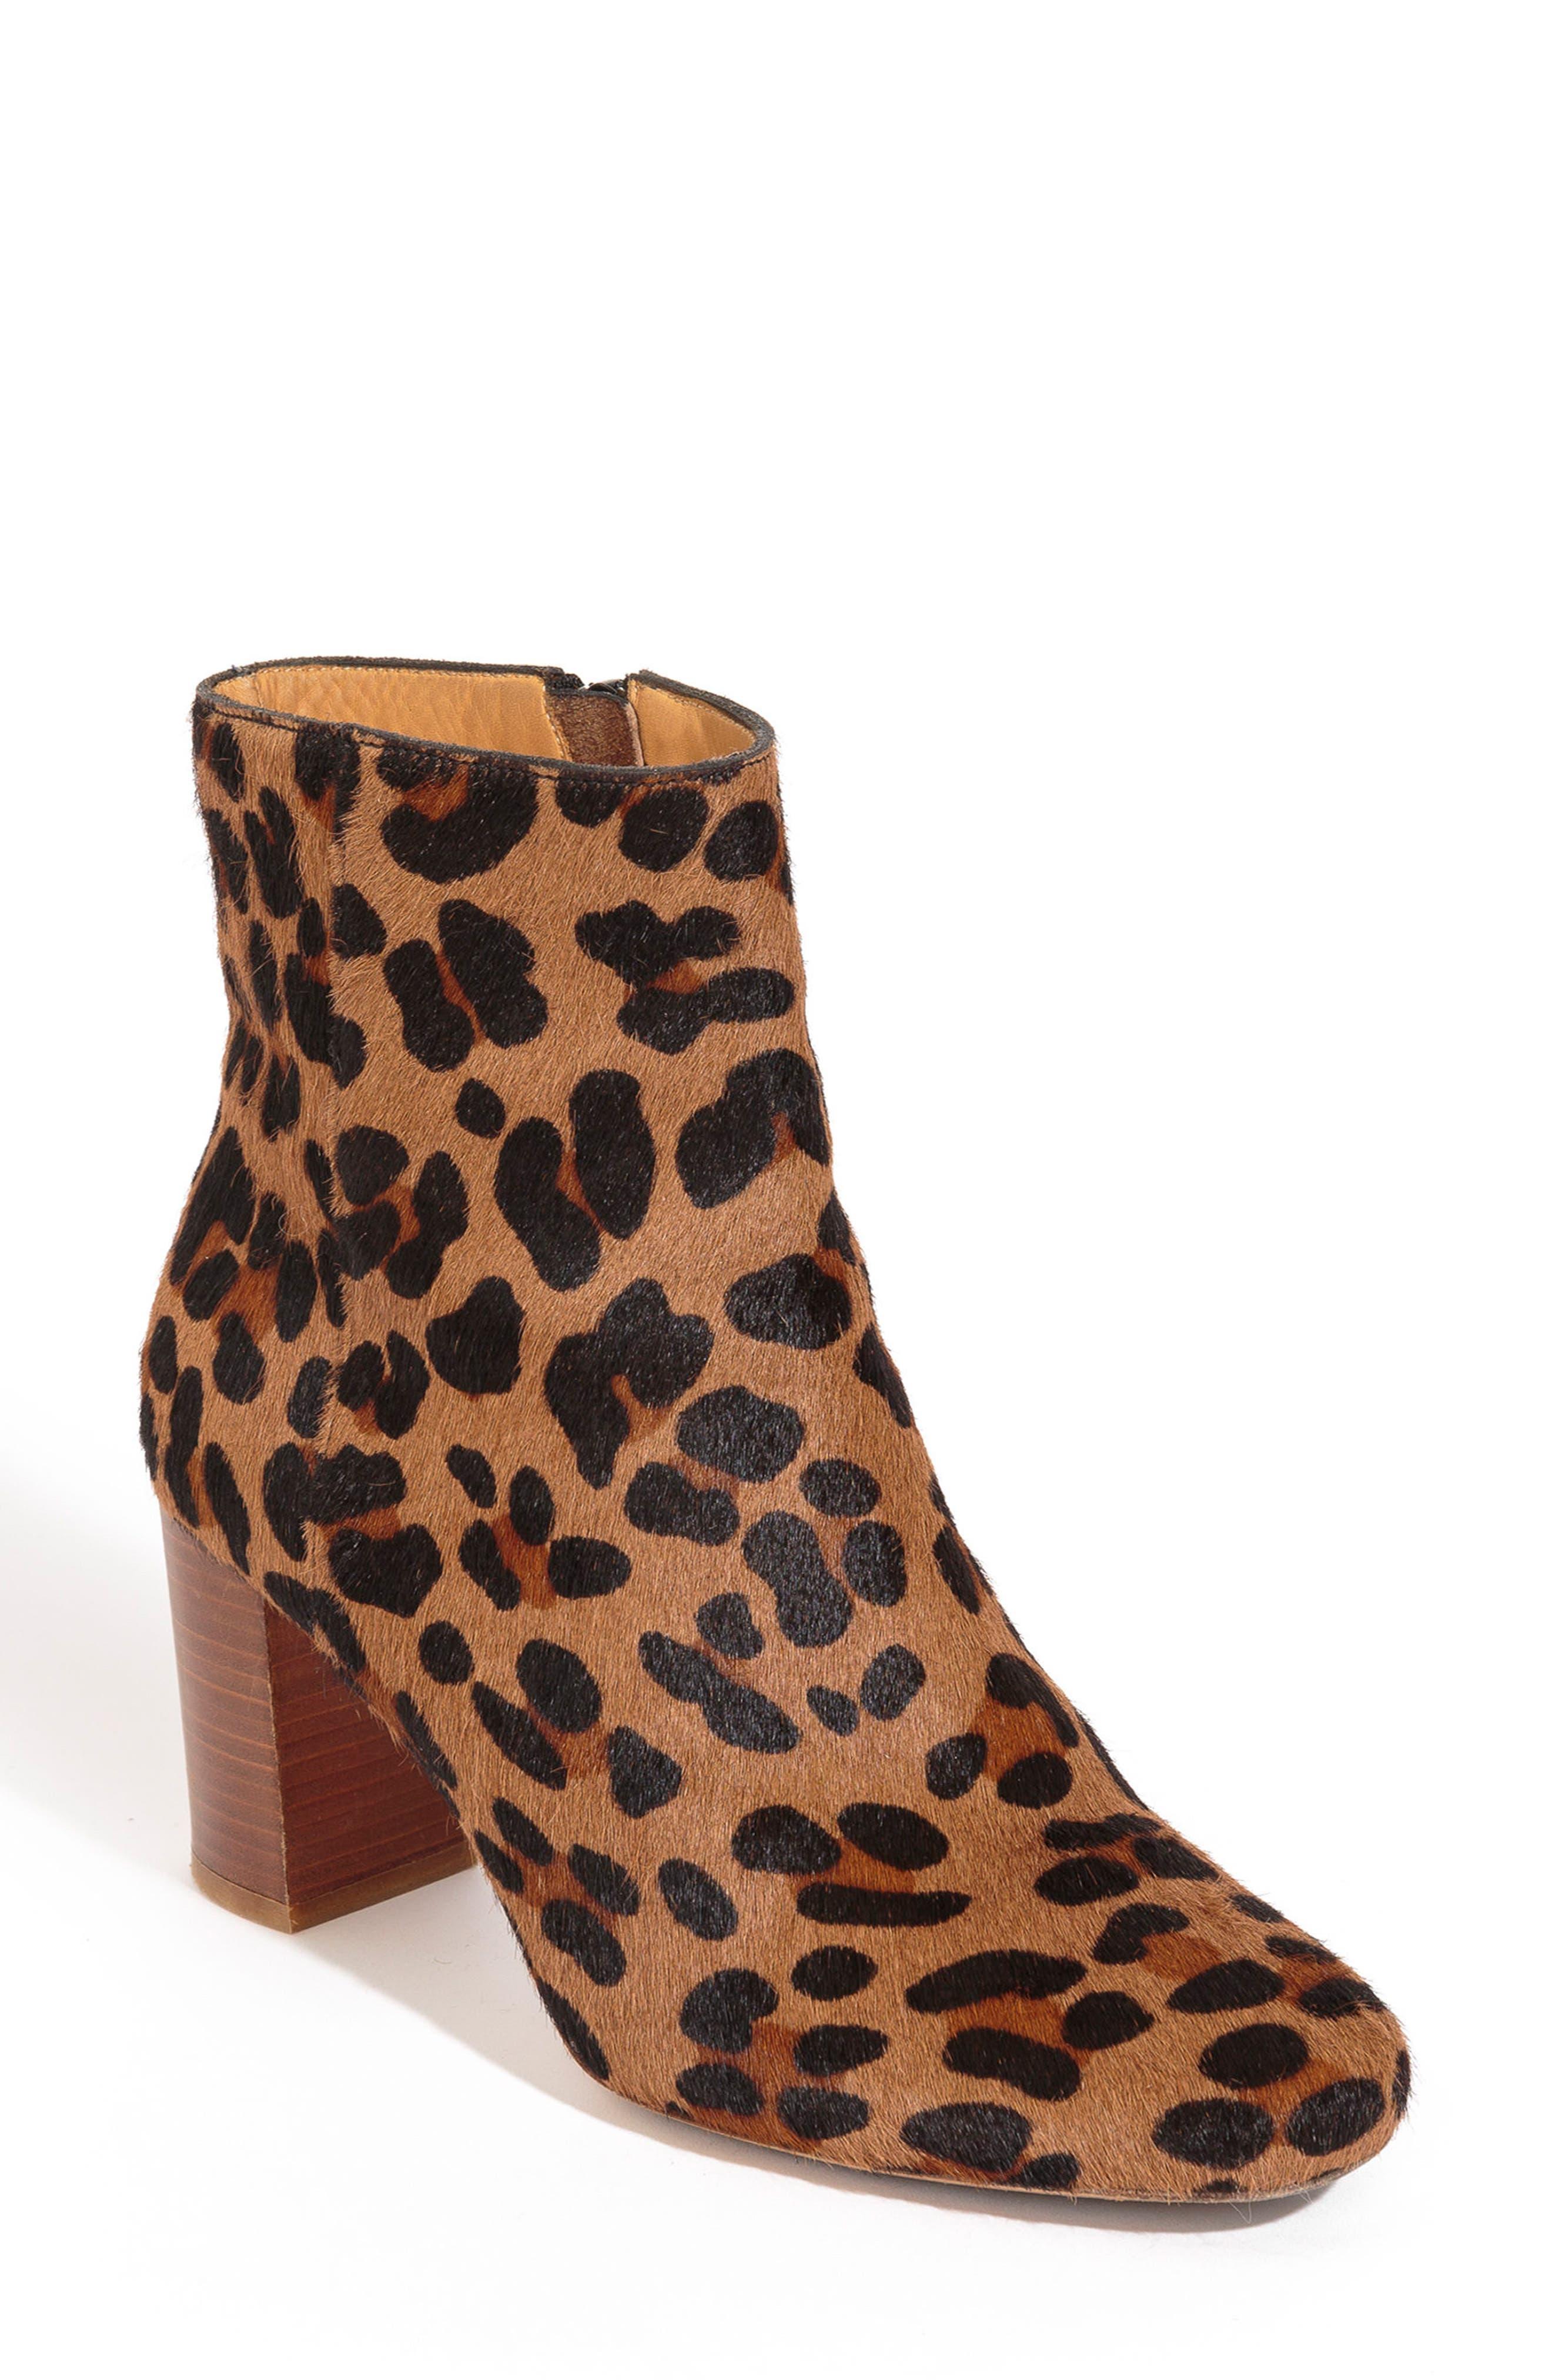 Léa Genuine Calf Hair Bootie,                             Main thumbnail 1, color,                             Leopard Print Leather